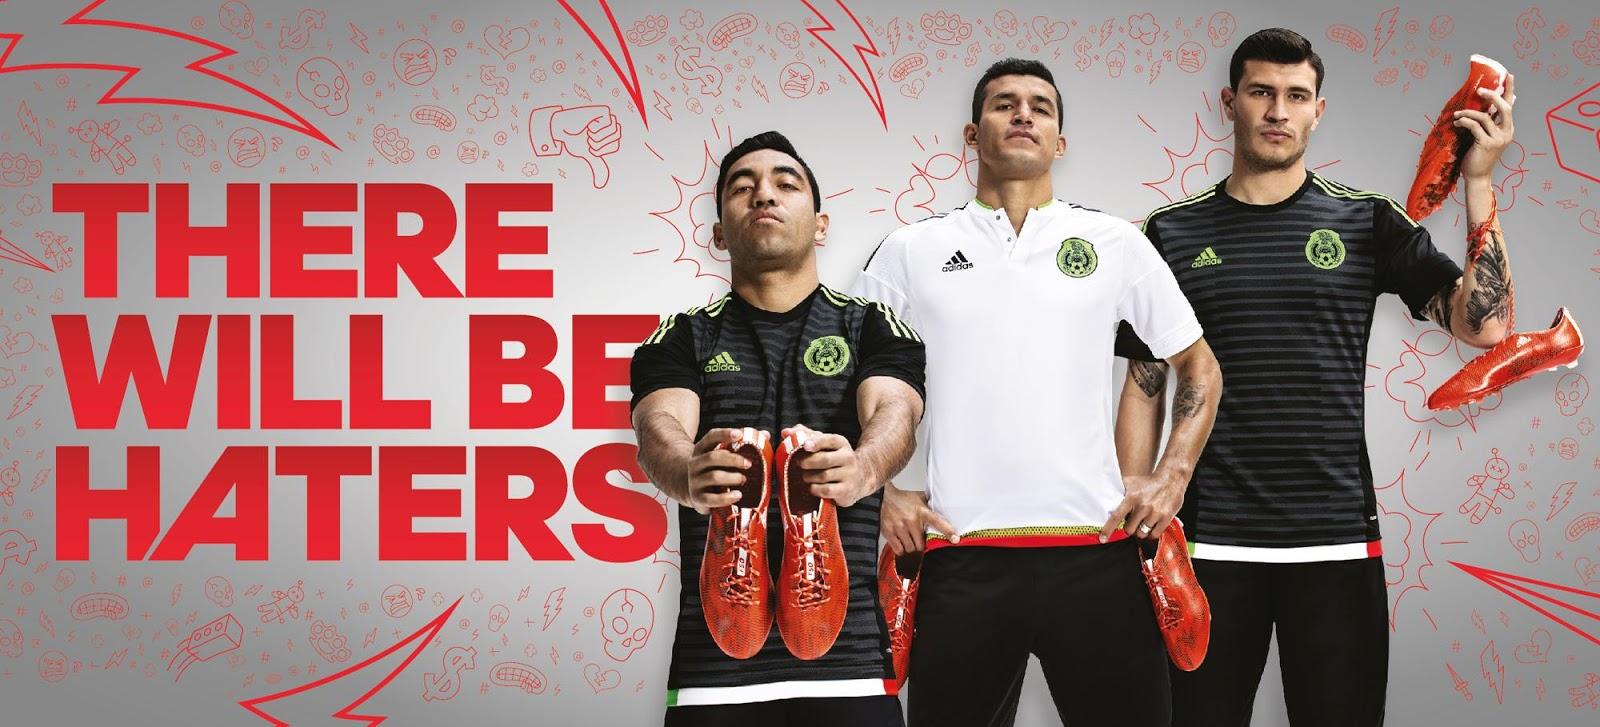 Mexico 2015 Copa America Kits Released   Footy Headlines 1600x727